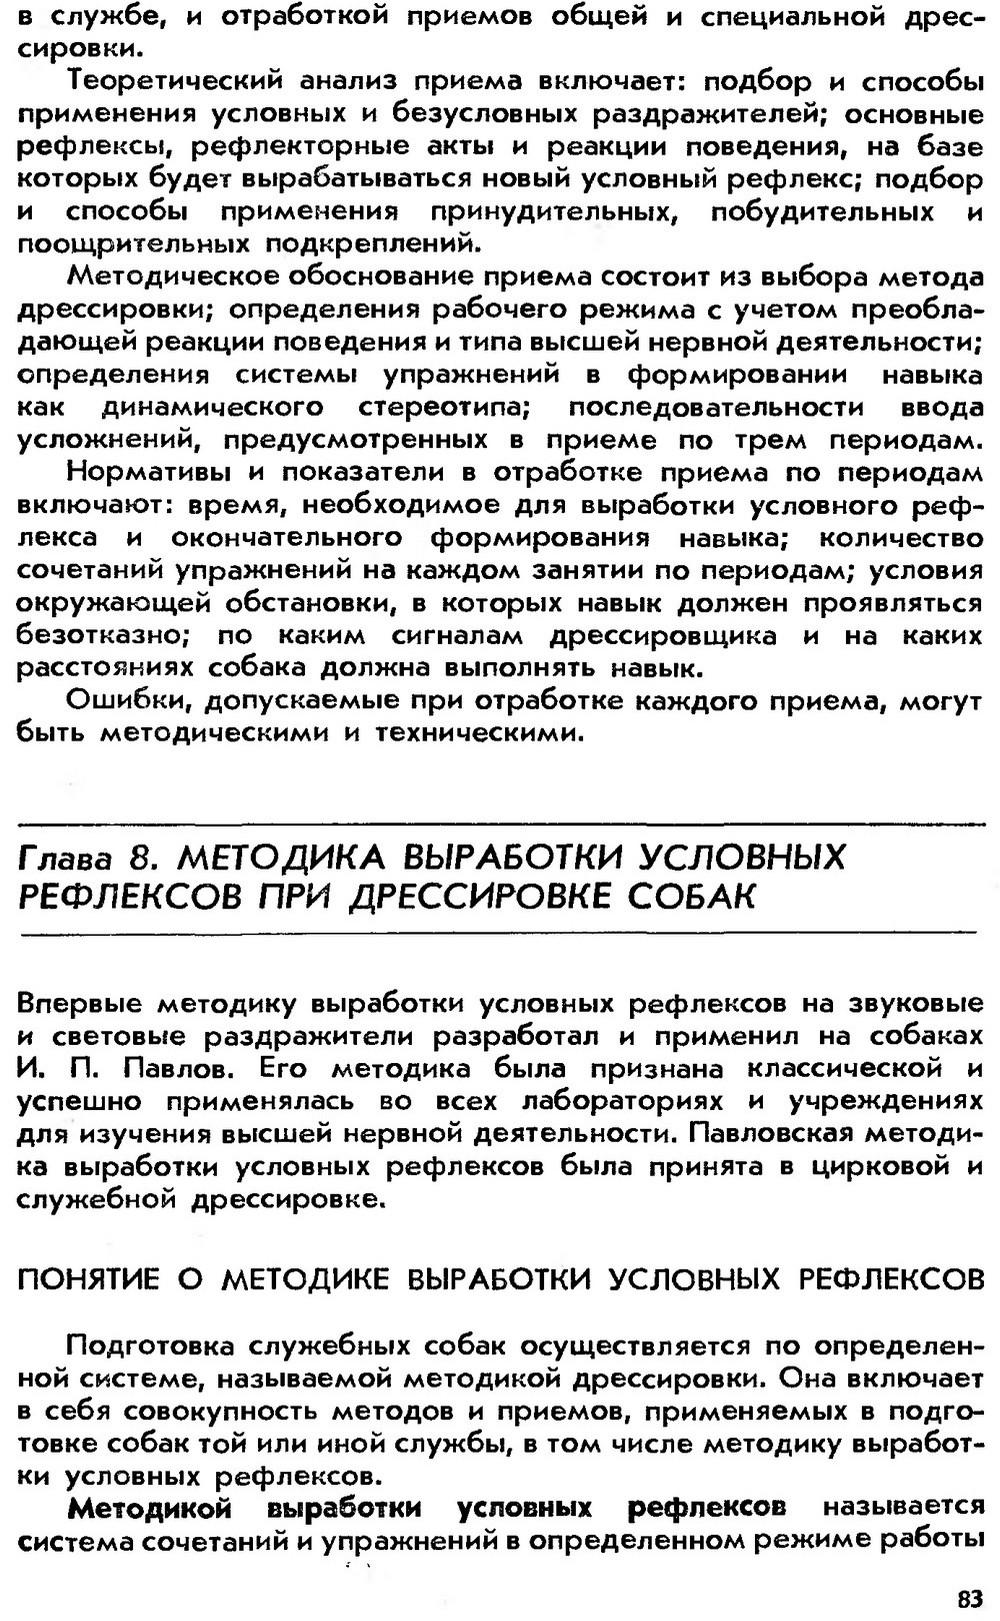 http://i6.imageban.ru/out/2014/01/15/51ce62ab27136b76081b8ebd3a361ee6.jpg